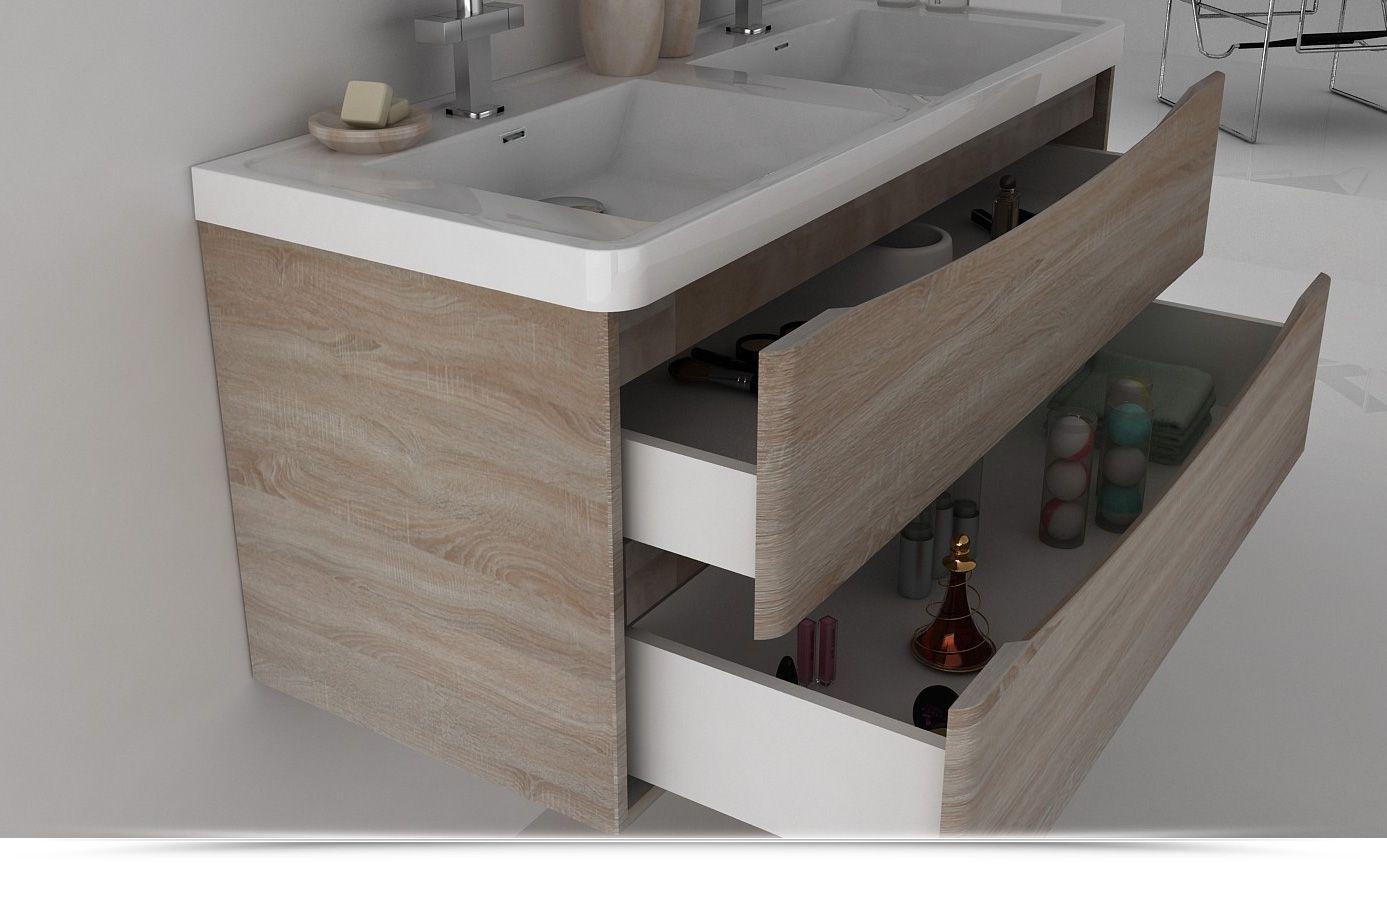 Mobile arredo bagno moderno sospeso doppio lavabo 120 - Prezzi lavandino bagno ...